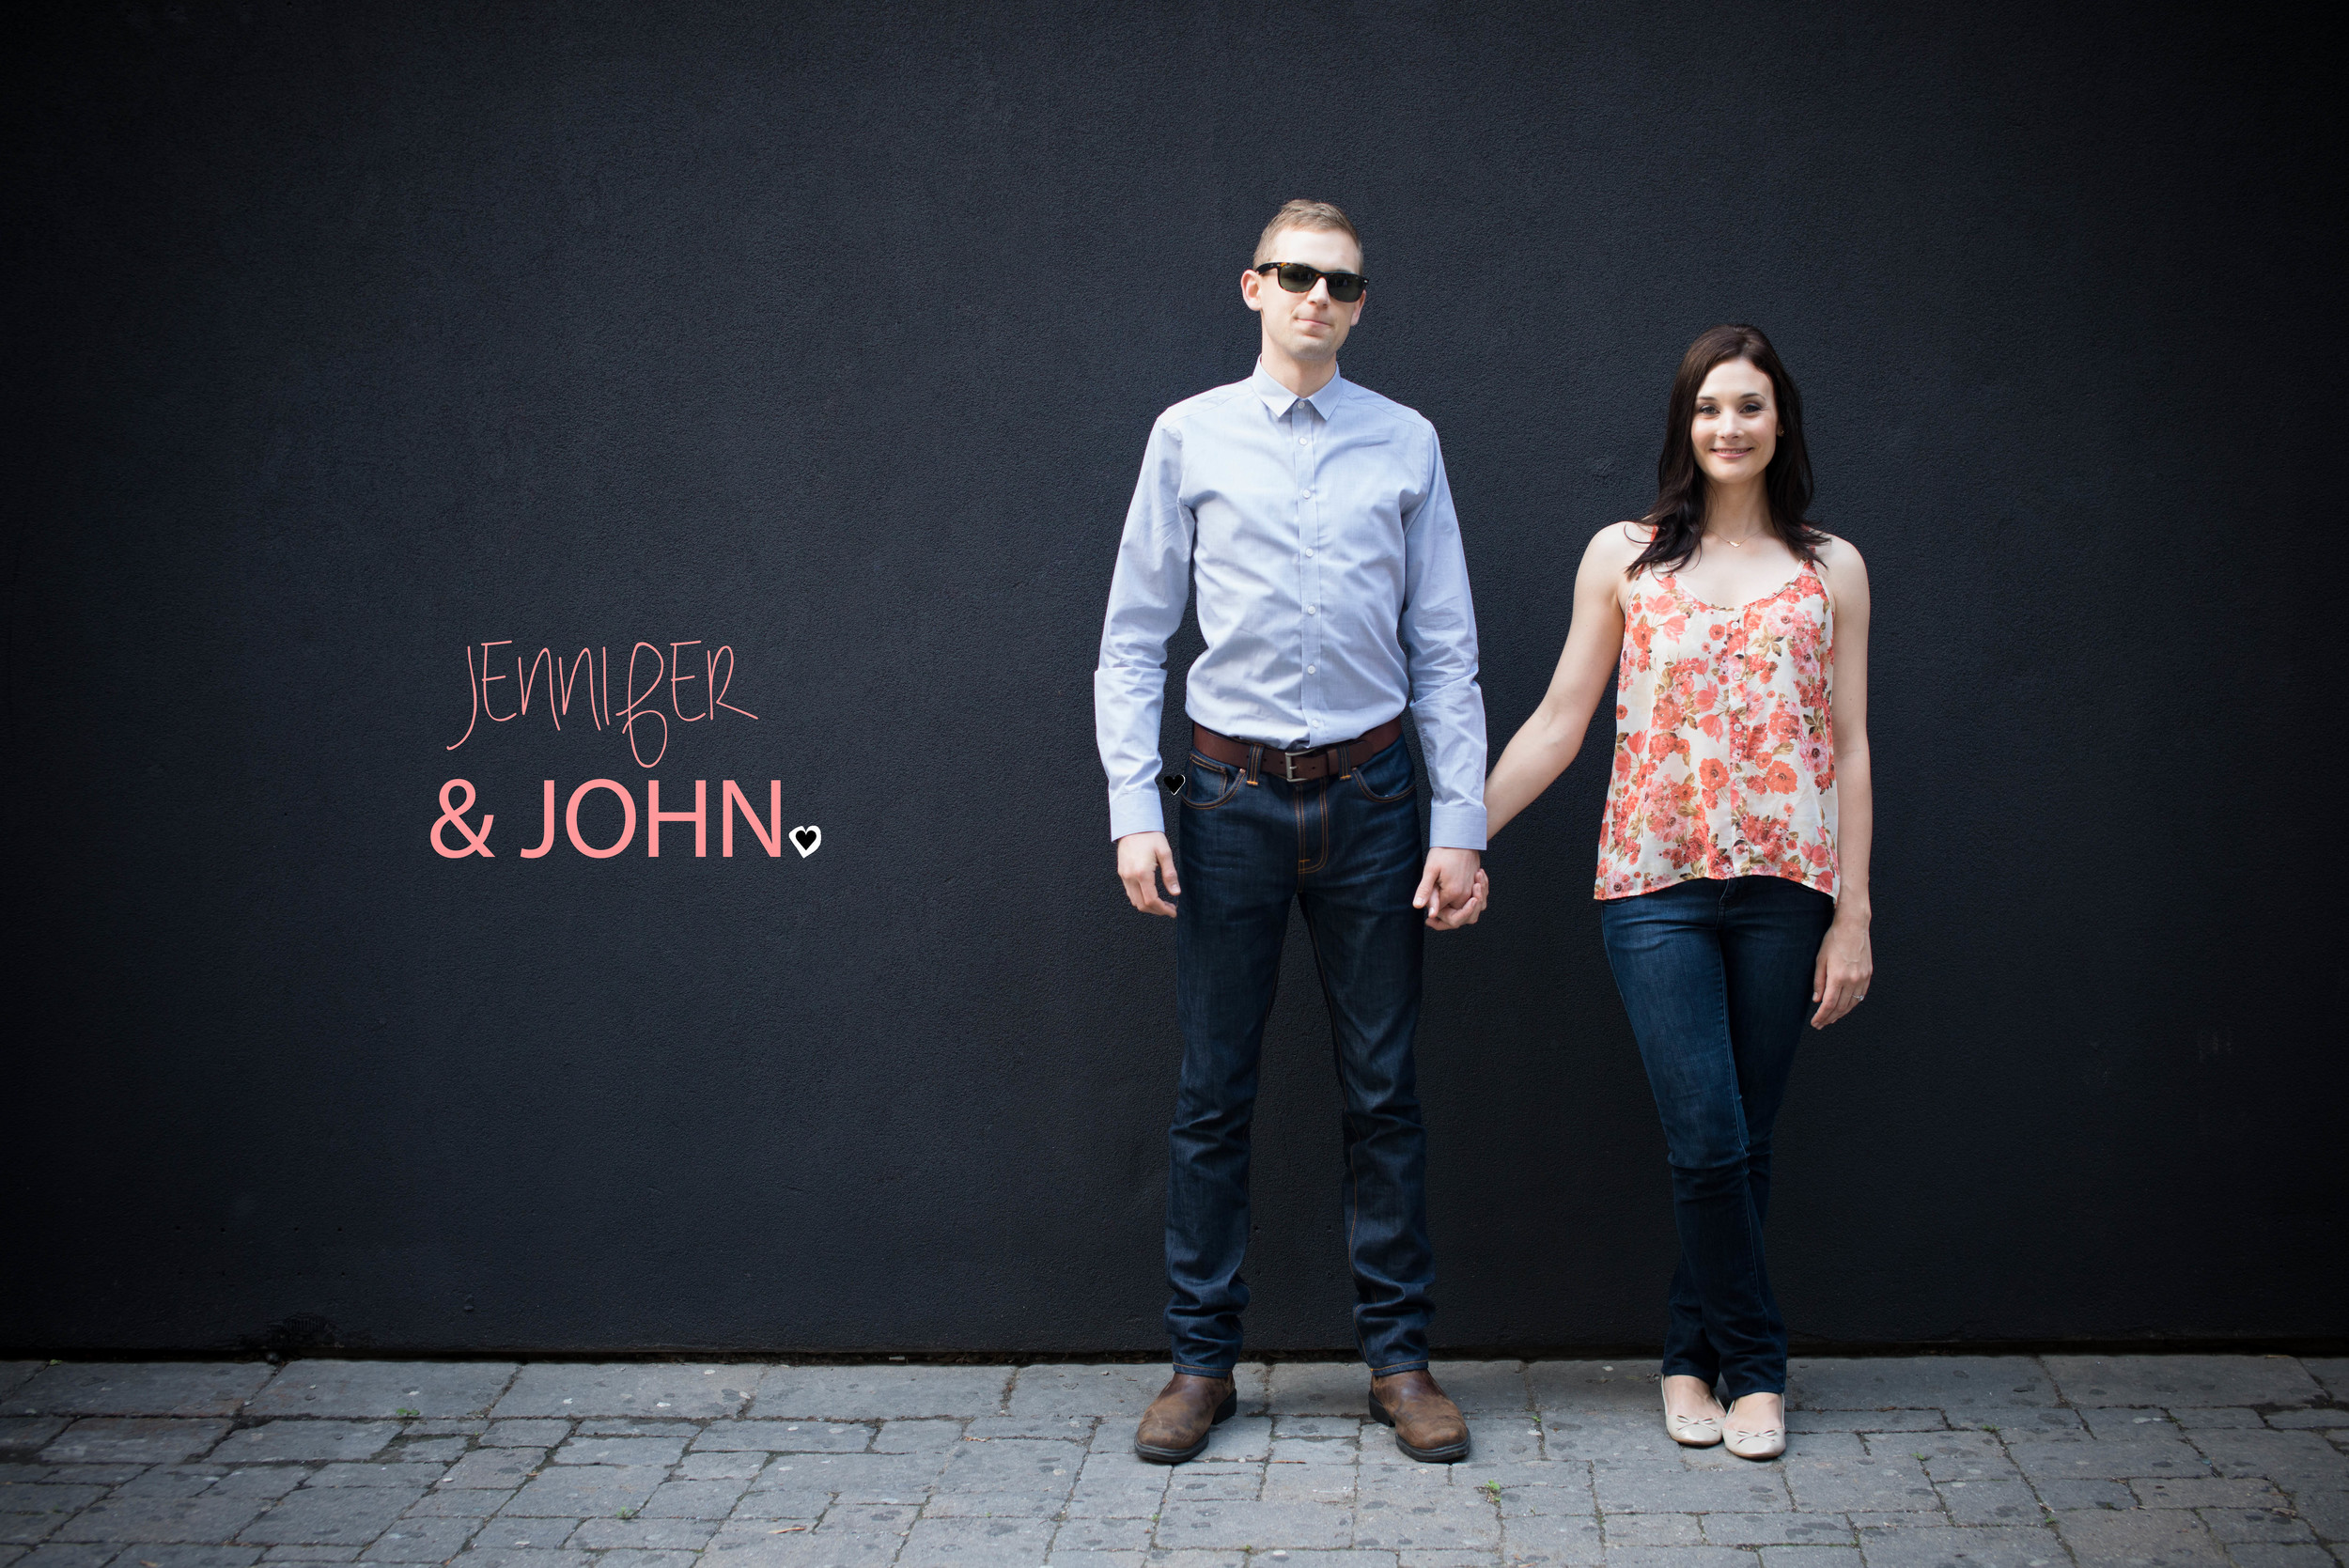 Jenn & John Engagement Session 2013 TNP HIGH RES-35 copy.jpg